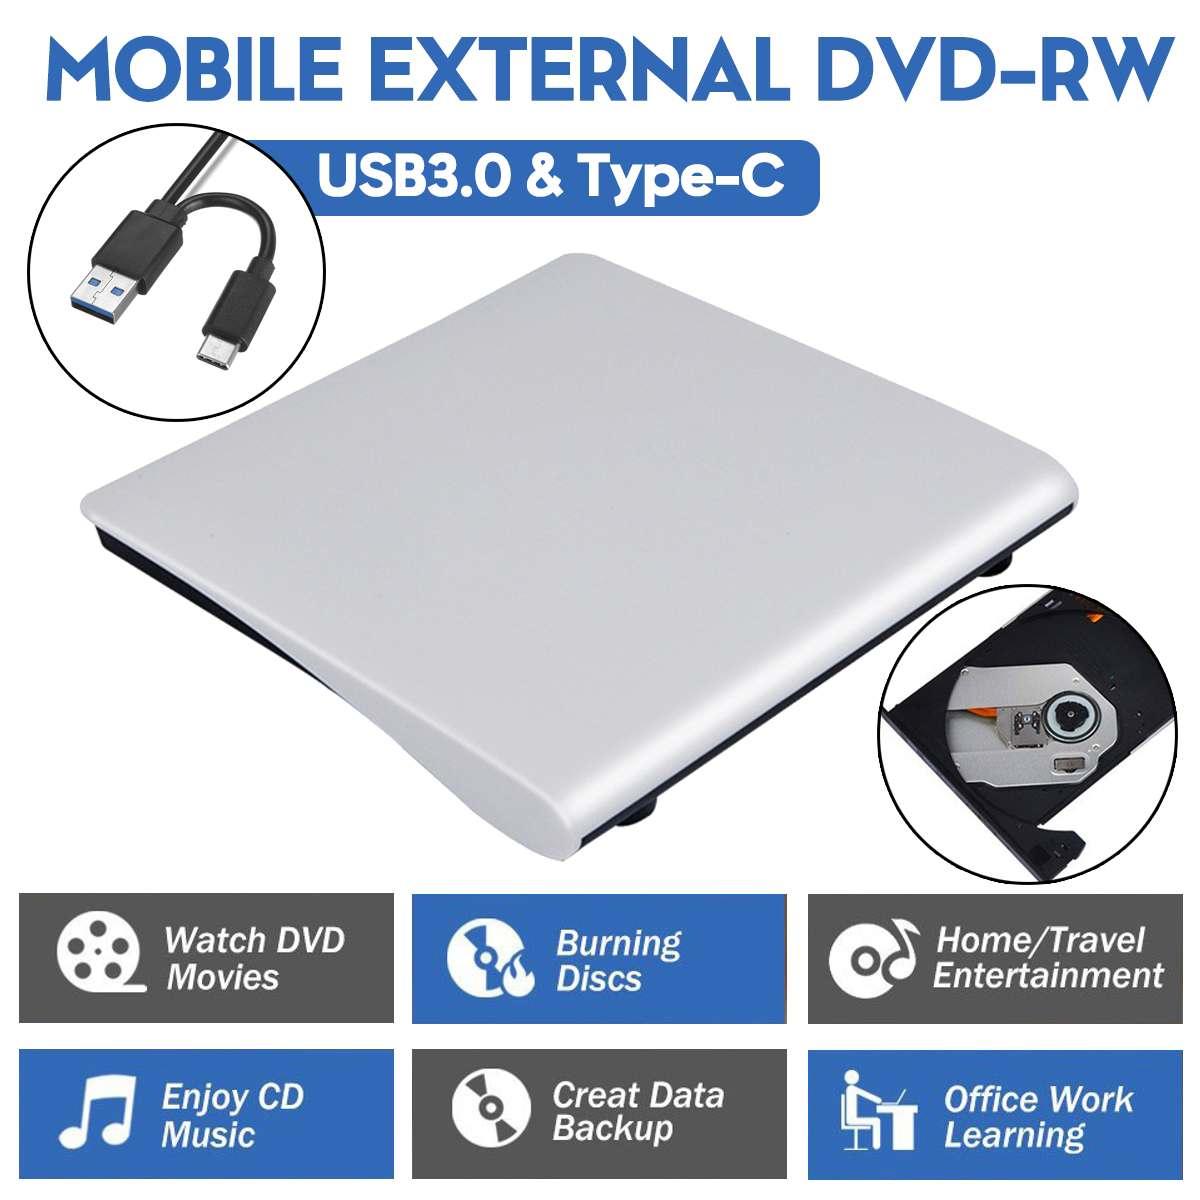 USB 3.0/Type-C External DVD Burner Writer Recorder DVD RW Optical Drive CD/DVD ROM Player MAC,s OS Windows XP/7/8/10